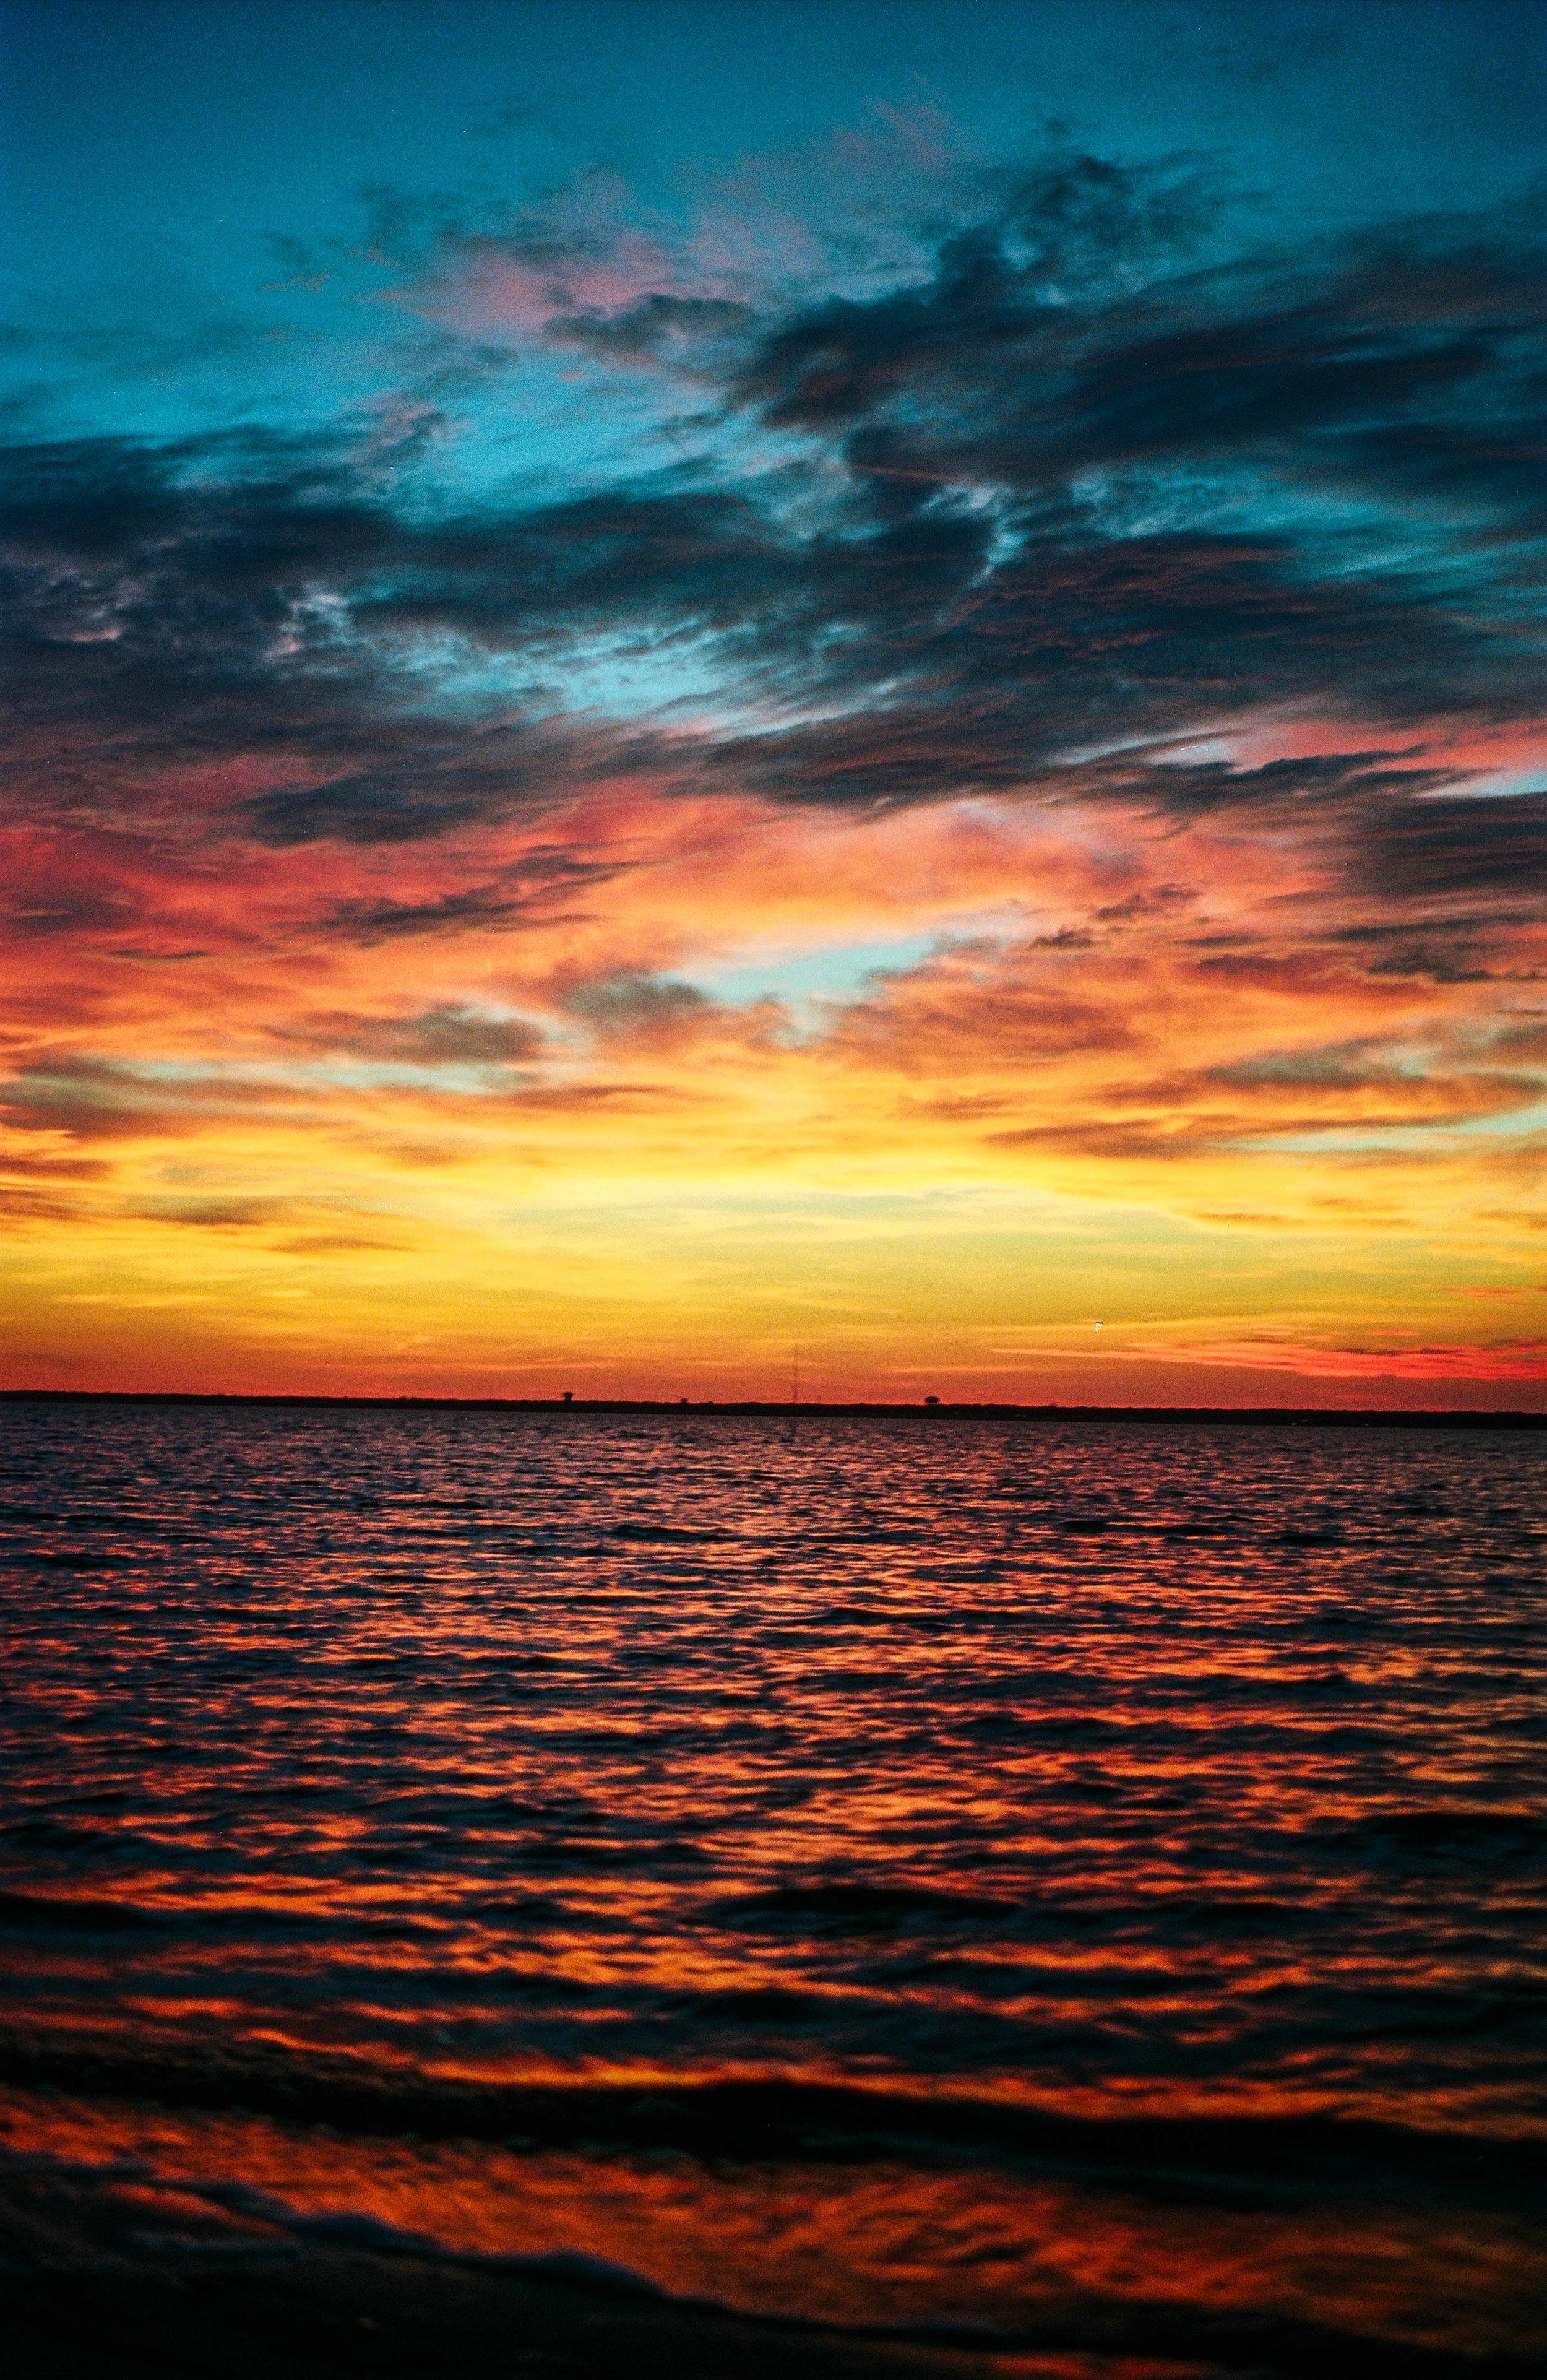 perf_sunset.jpg